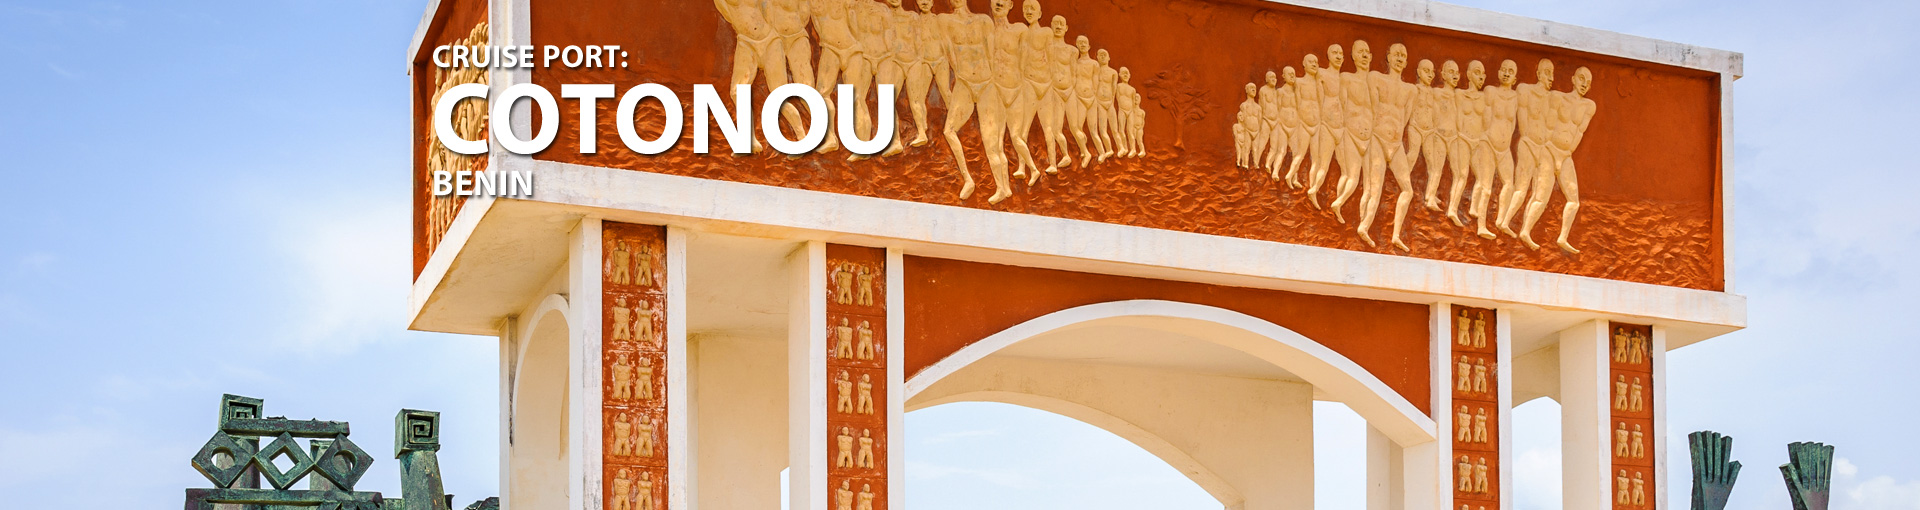 Cruises to Cotonou, Benin